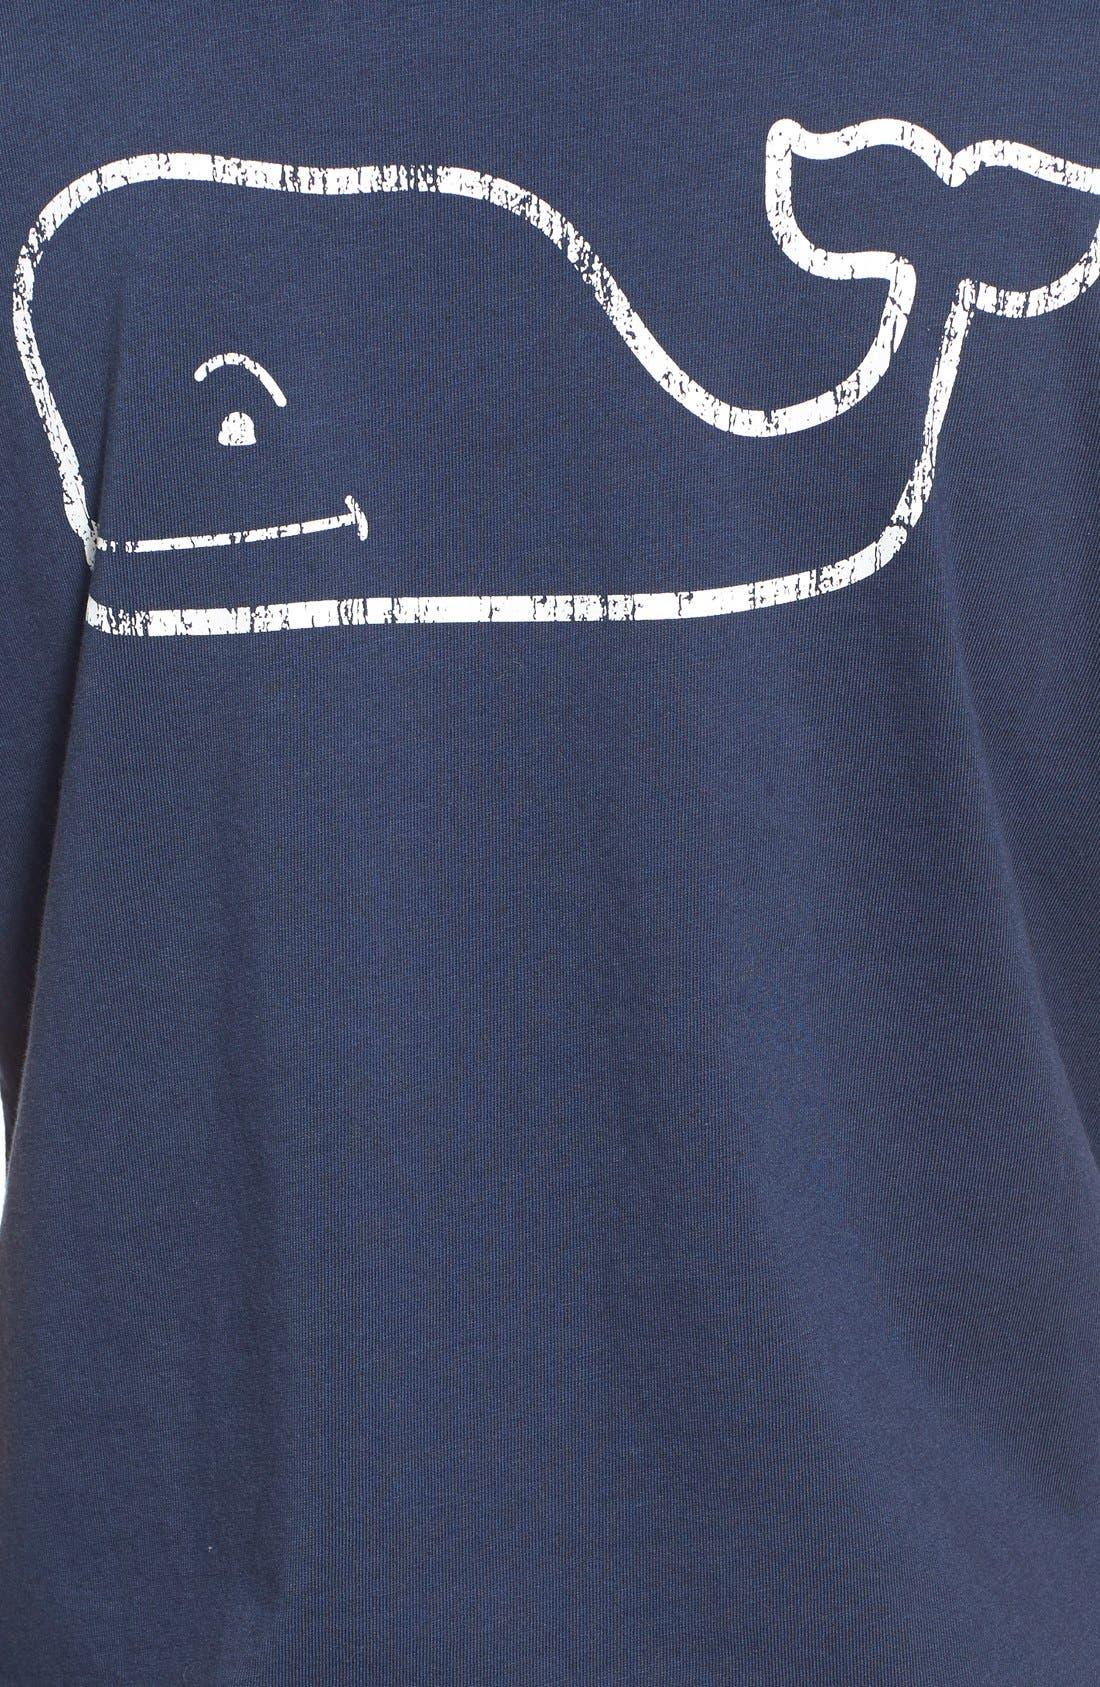 Whale Graphic Short Sleeve Pocket Tee,                             Alternate thumbnail 3, color,                             Blue Blaze